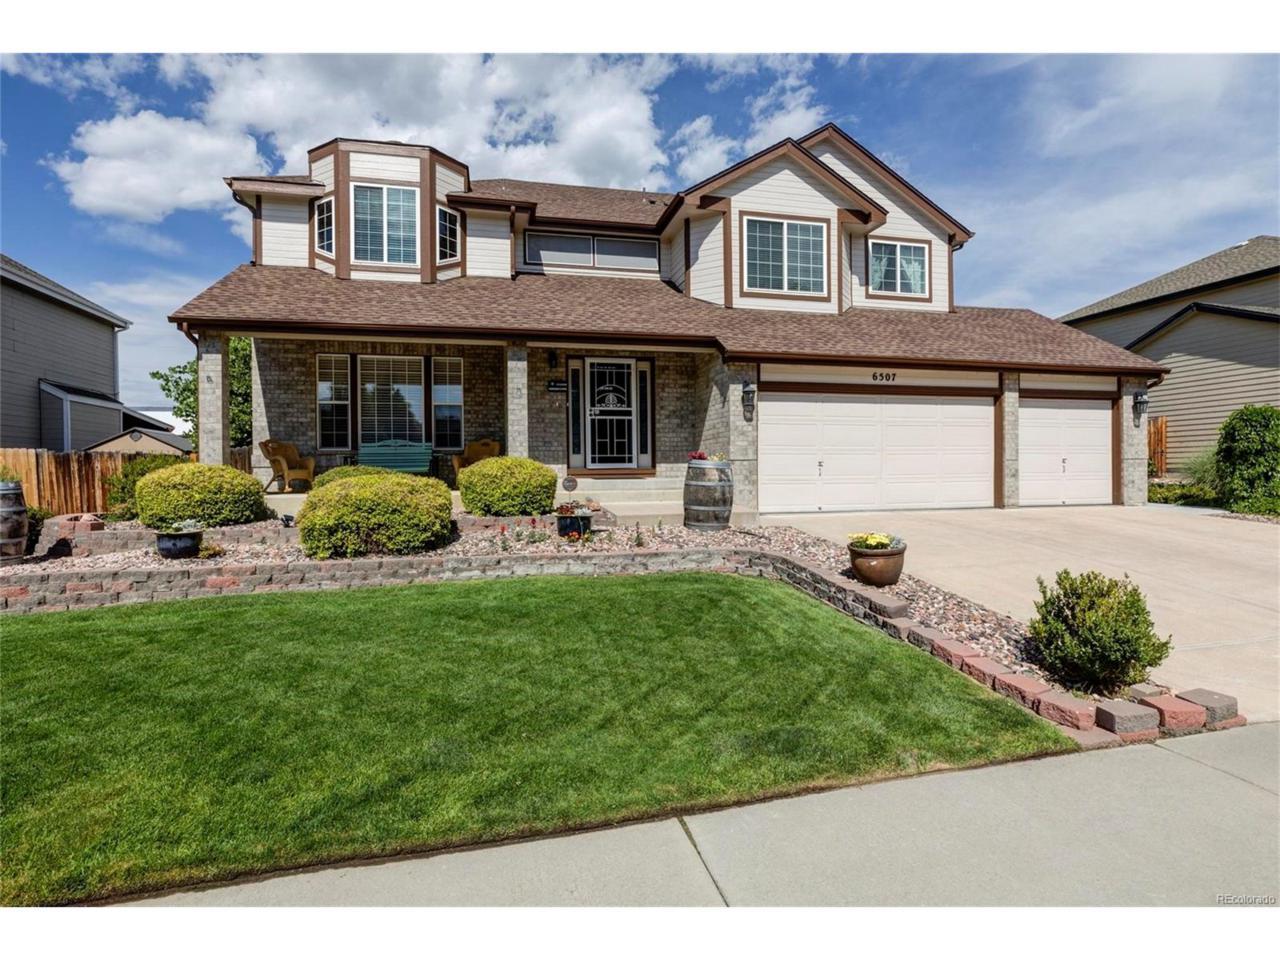 6507 Torrey Court, Arvada, CO 80007 (MLS #7951231) :: 8z Real Estate